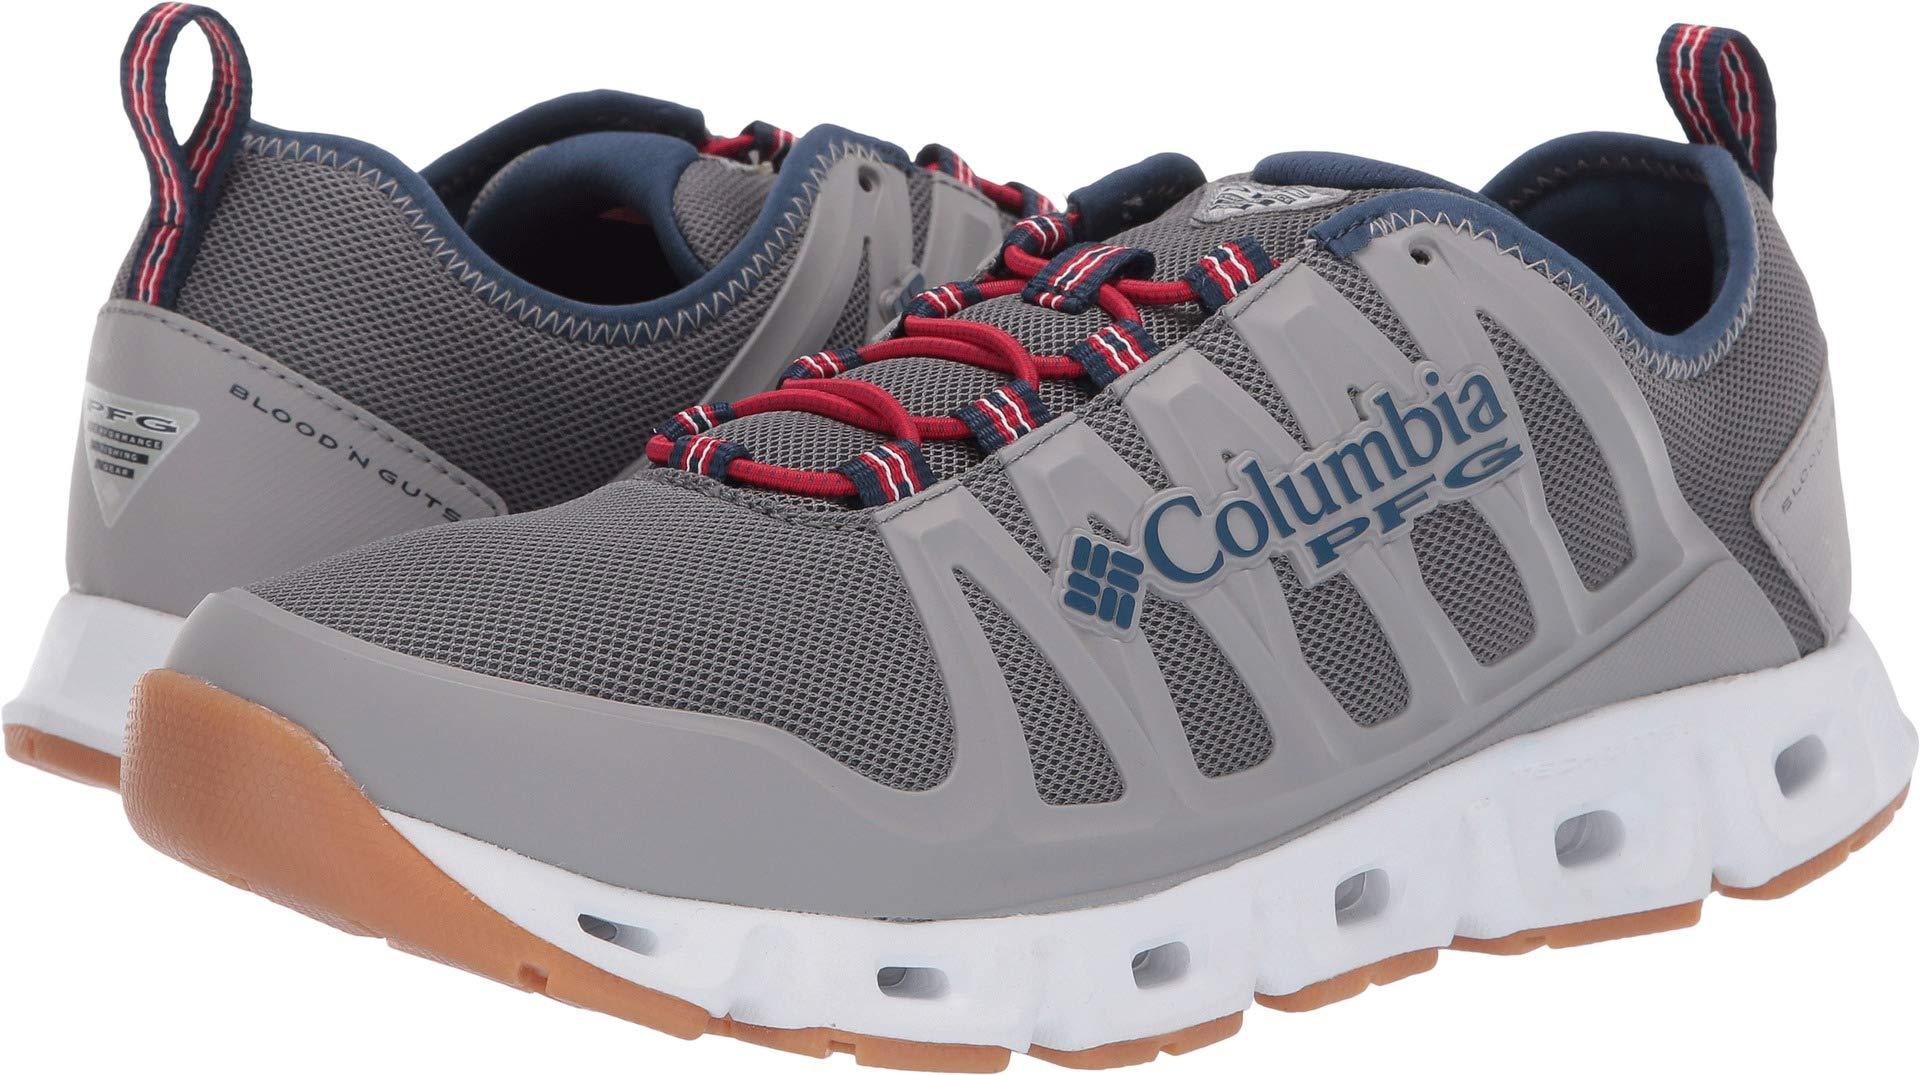 Columbia PFG Men's Megavent II PFG Water Shoe, Ti Grey Steel/Carbon, 9.5 Regular US by Columbia